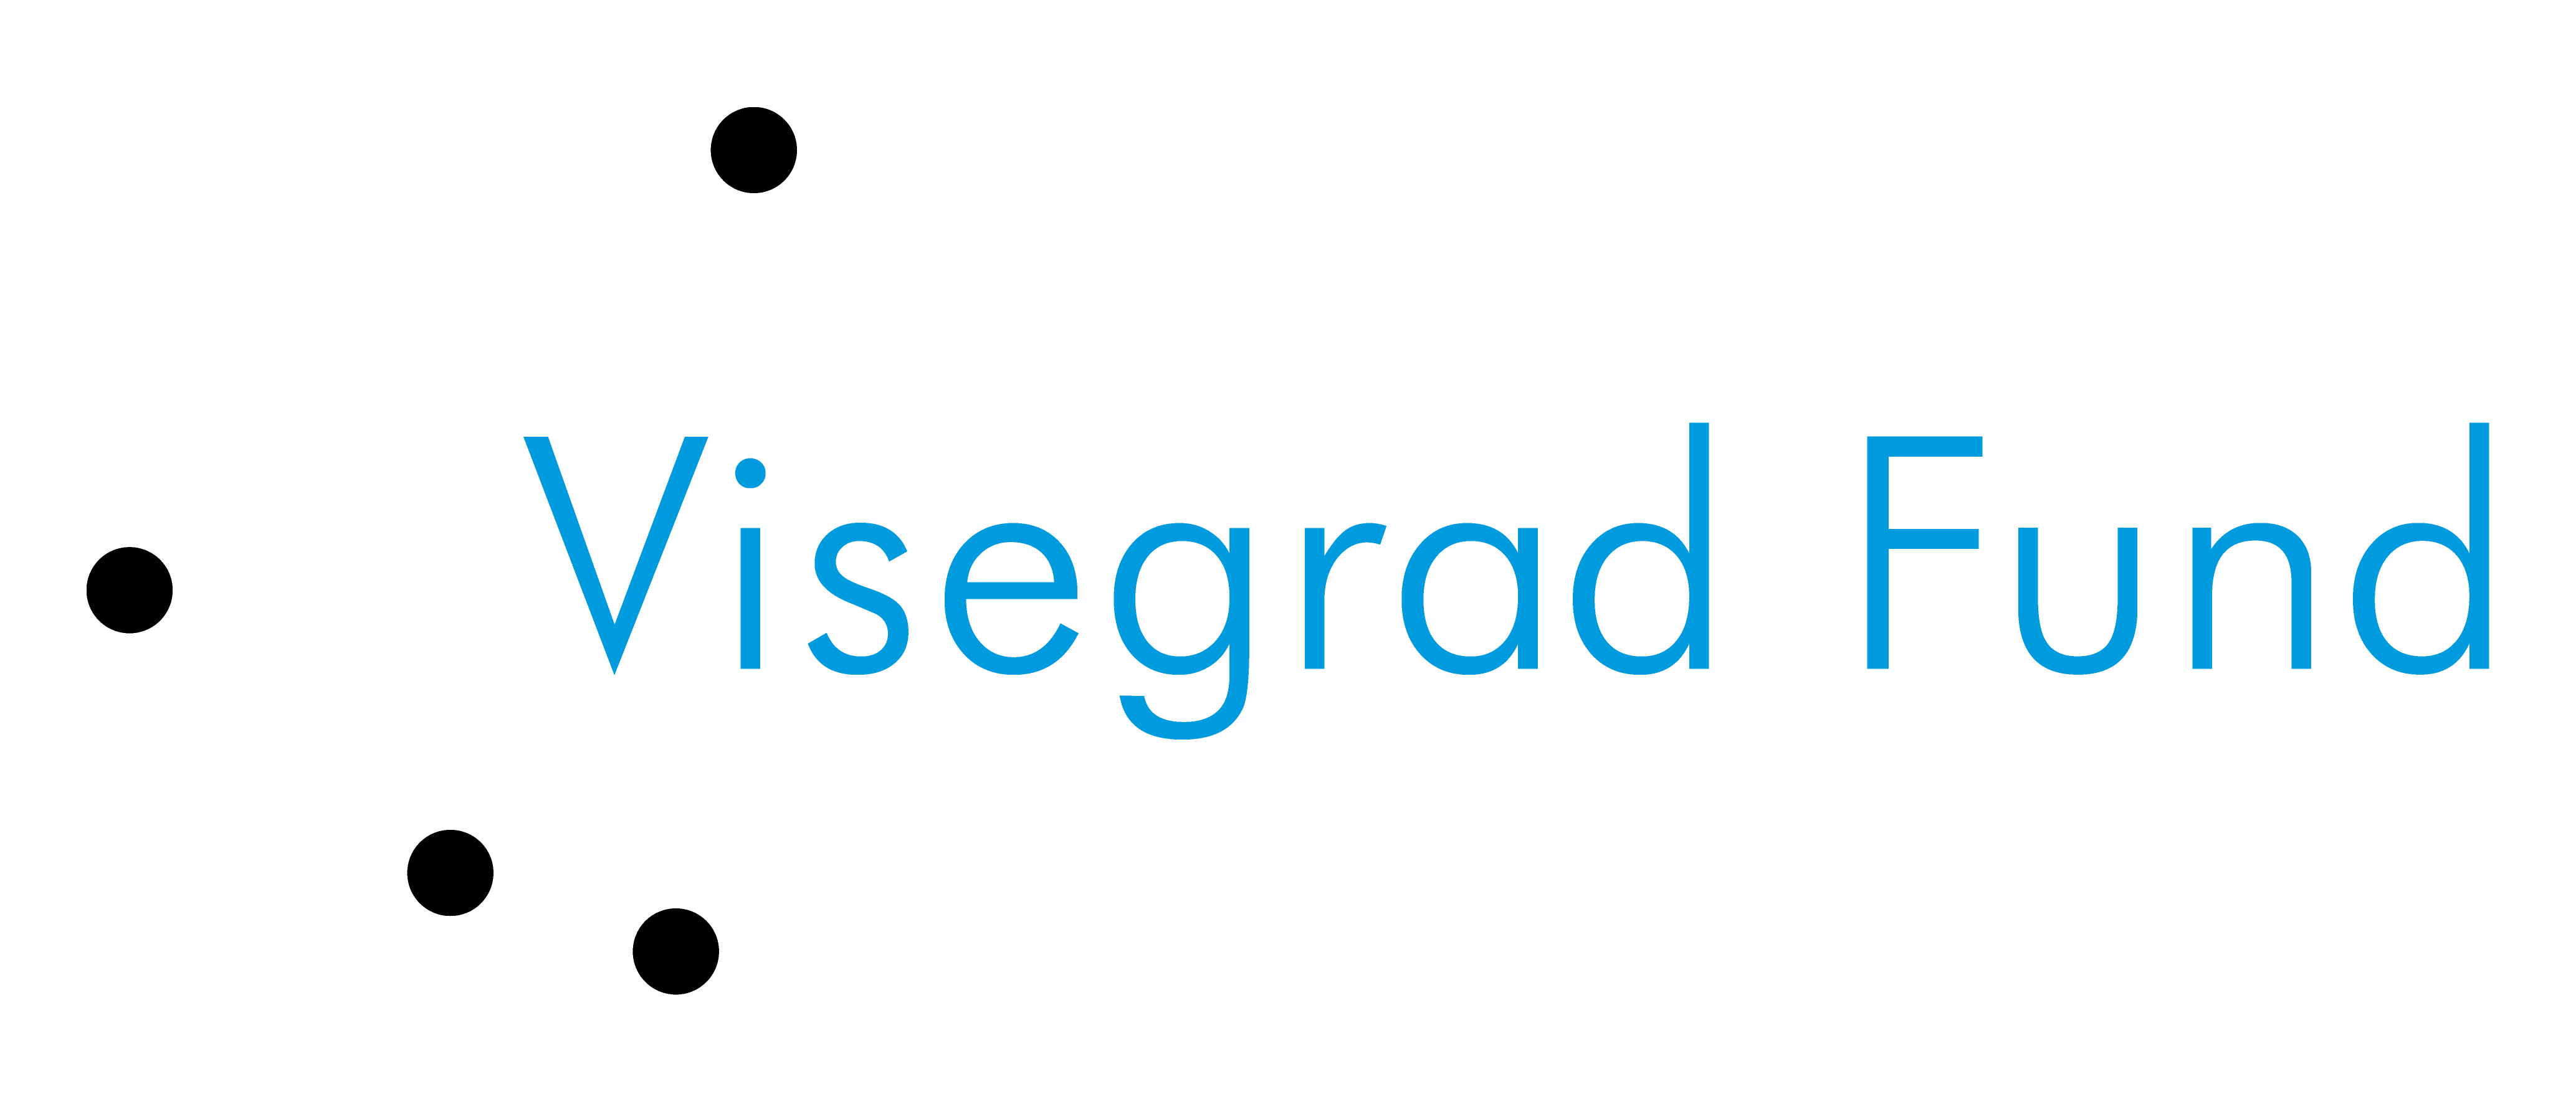 Výsledek obrázku pro visegrad fund logo